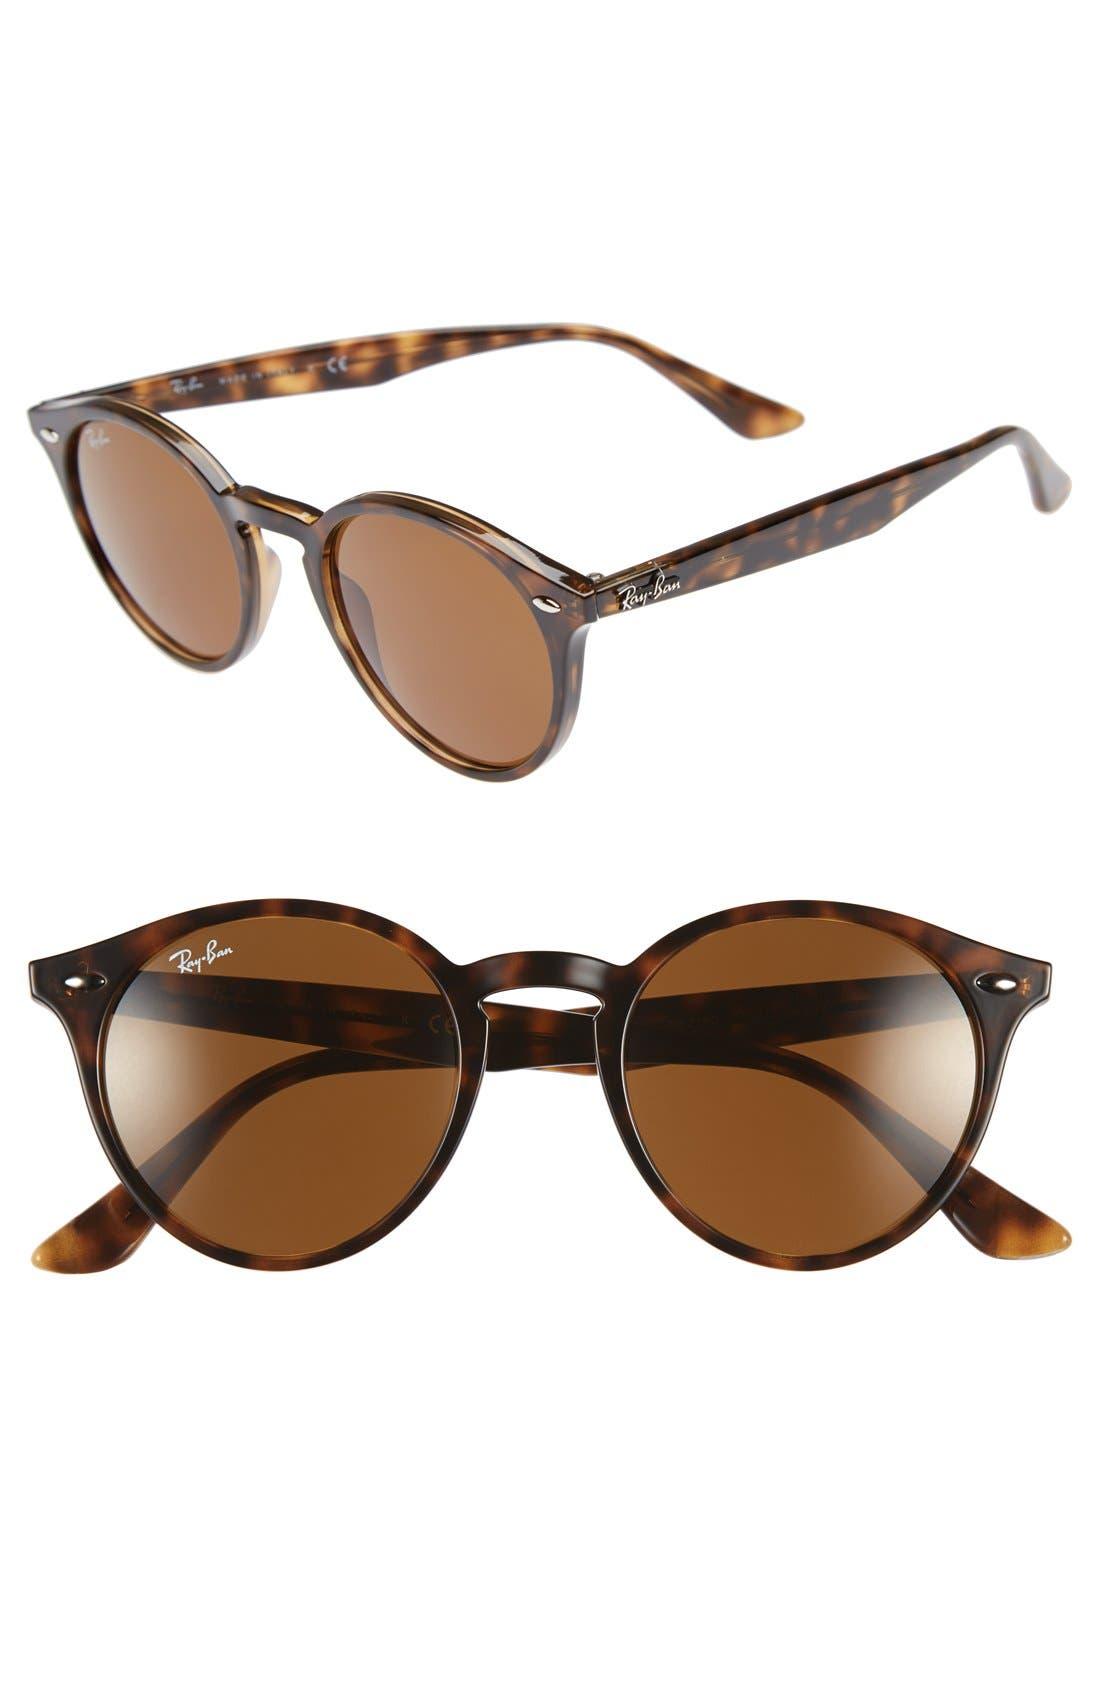 Highstreet 49mm Round Sunglasses,                             Main thumbnail 1, color,                             Dark Havana